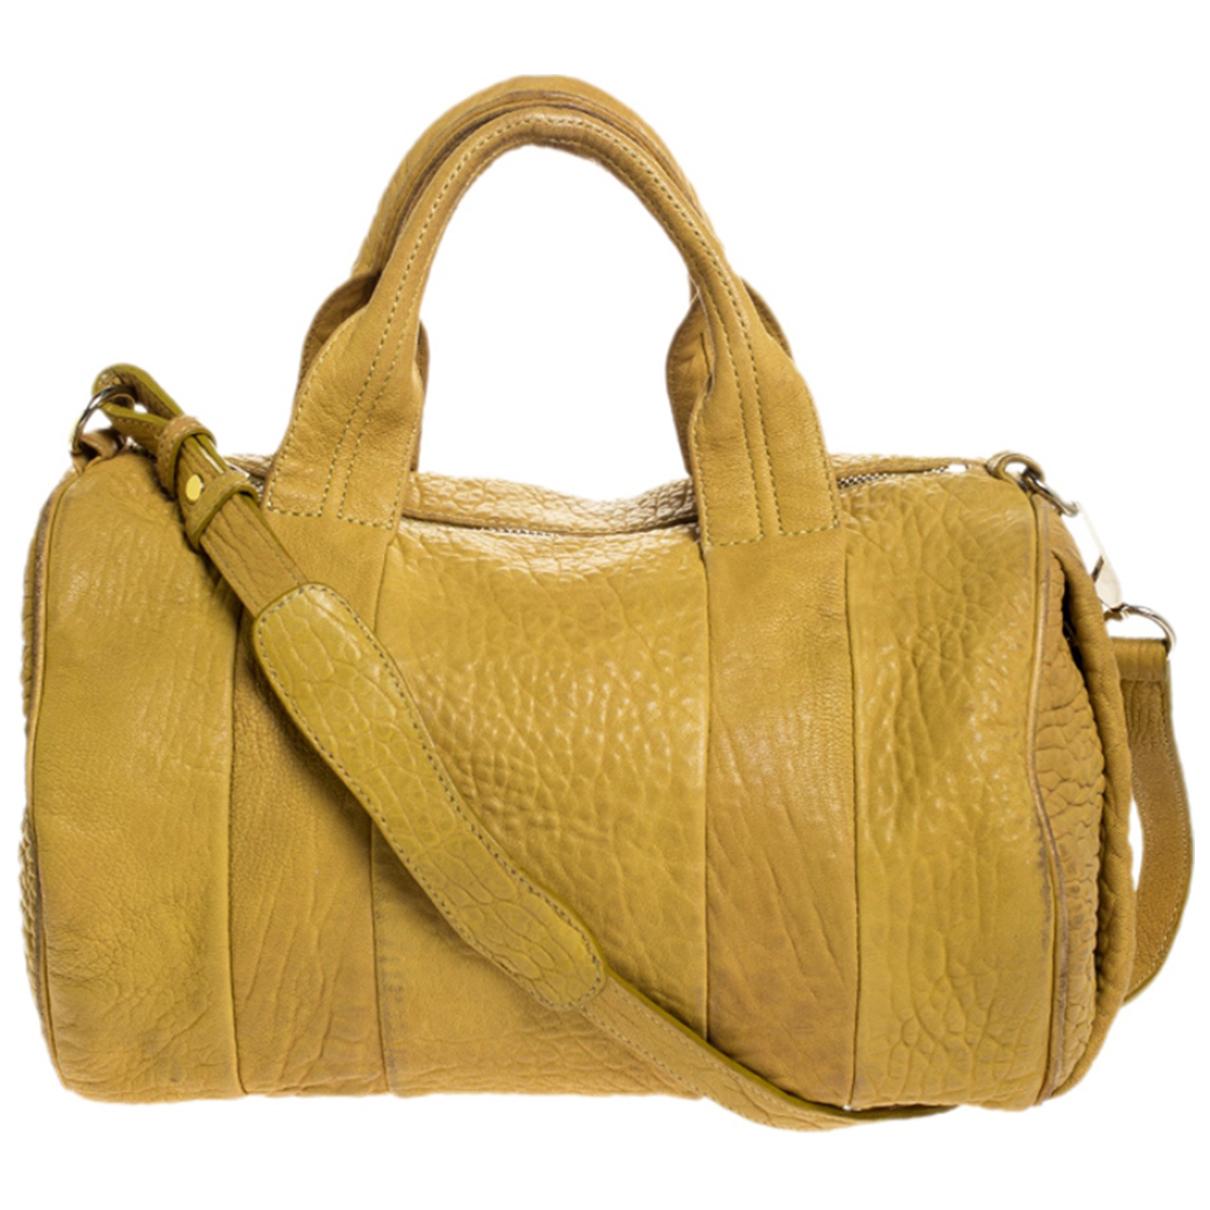 Alexander Wang \N Handtasche in  Gelb Leder